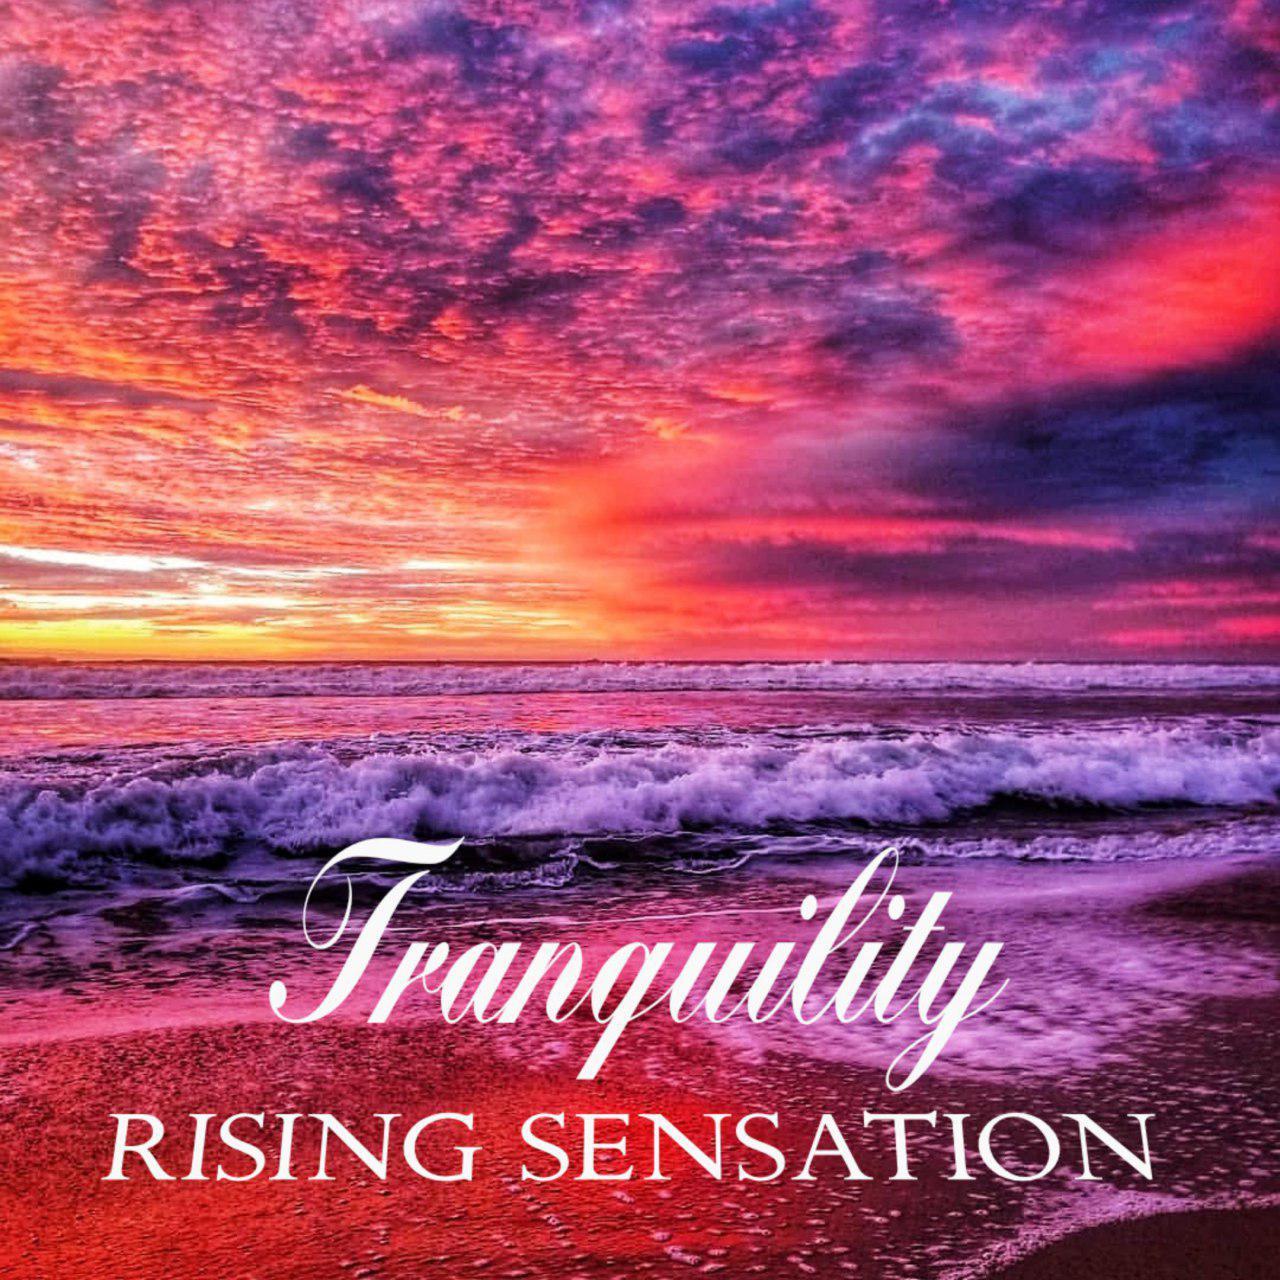 Rising Sensation – Tranquility